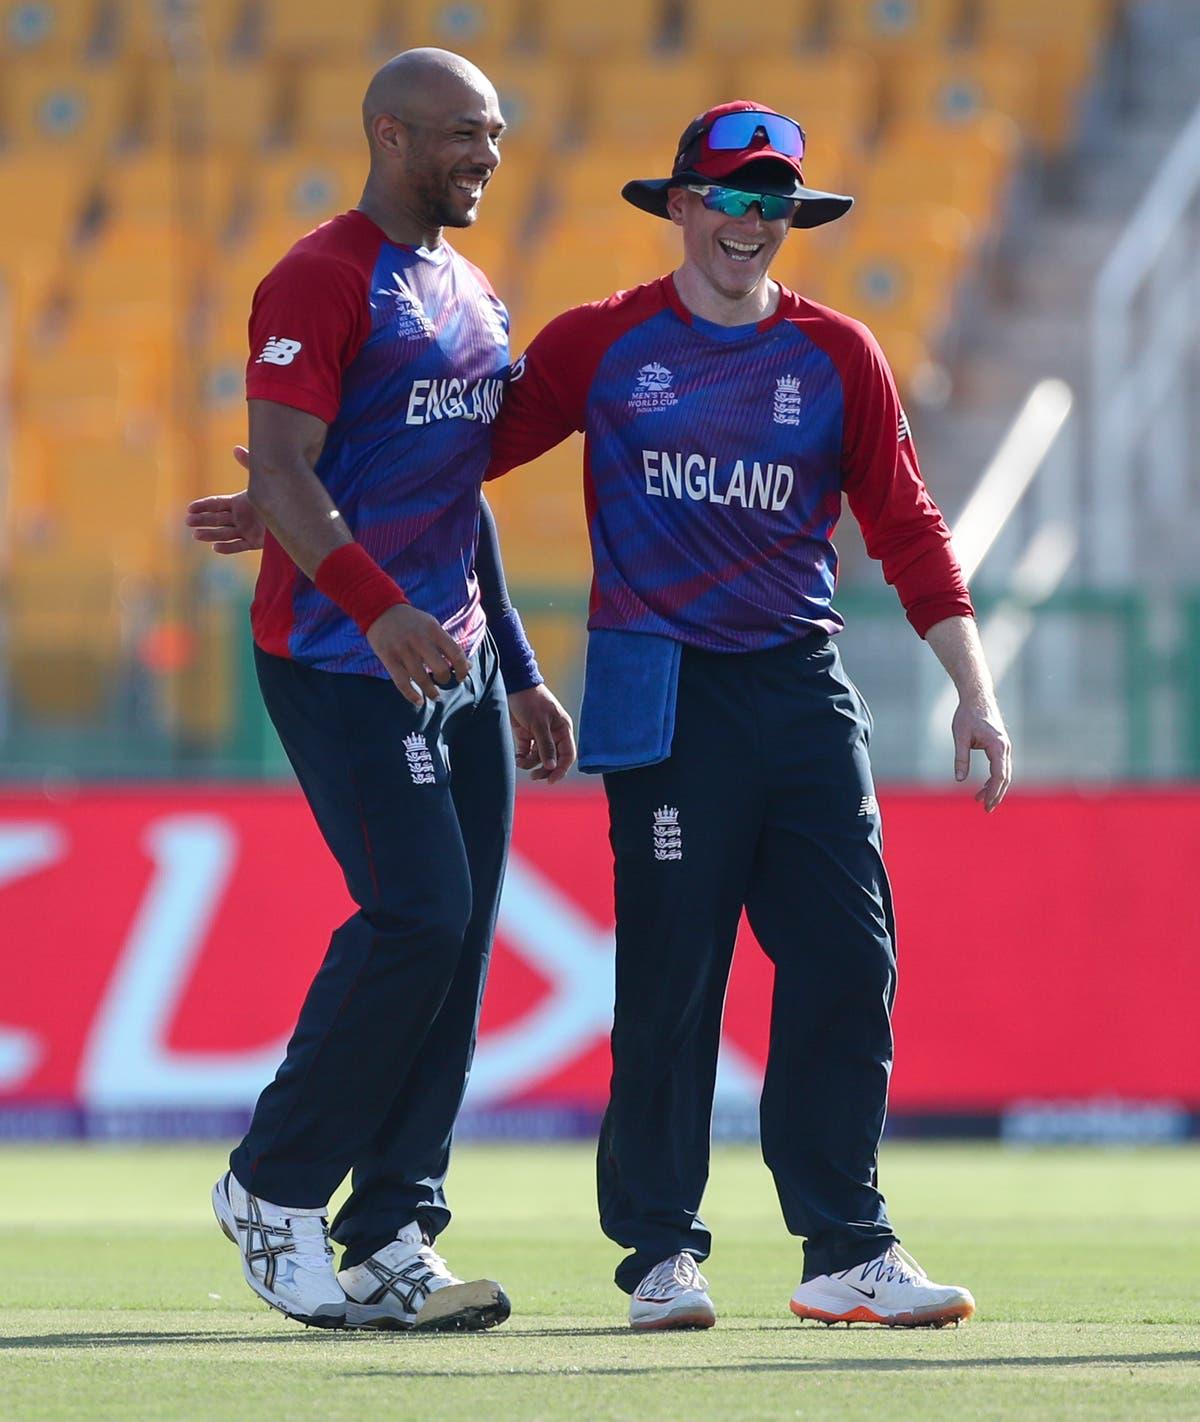 Tymal Mills takes three wickets as Bangladesh set England 125 to win